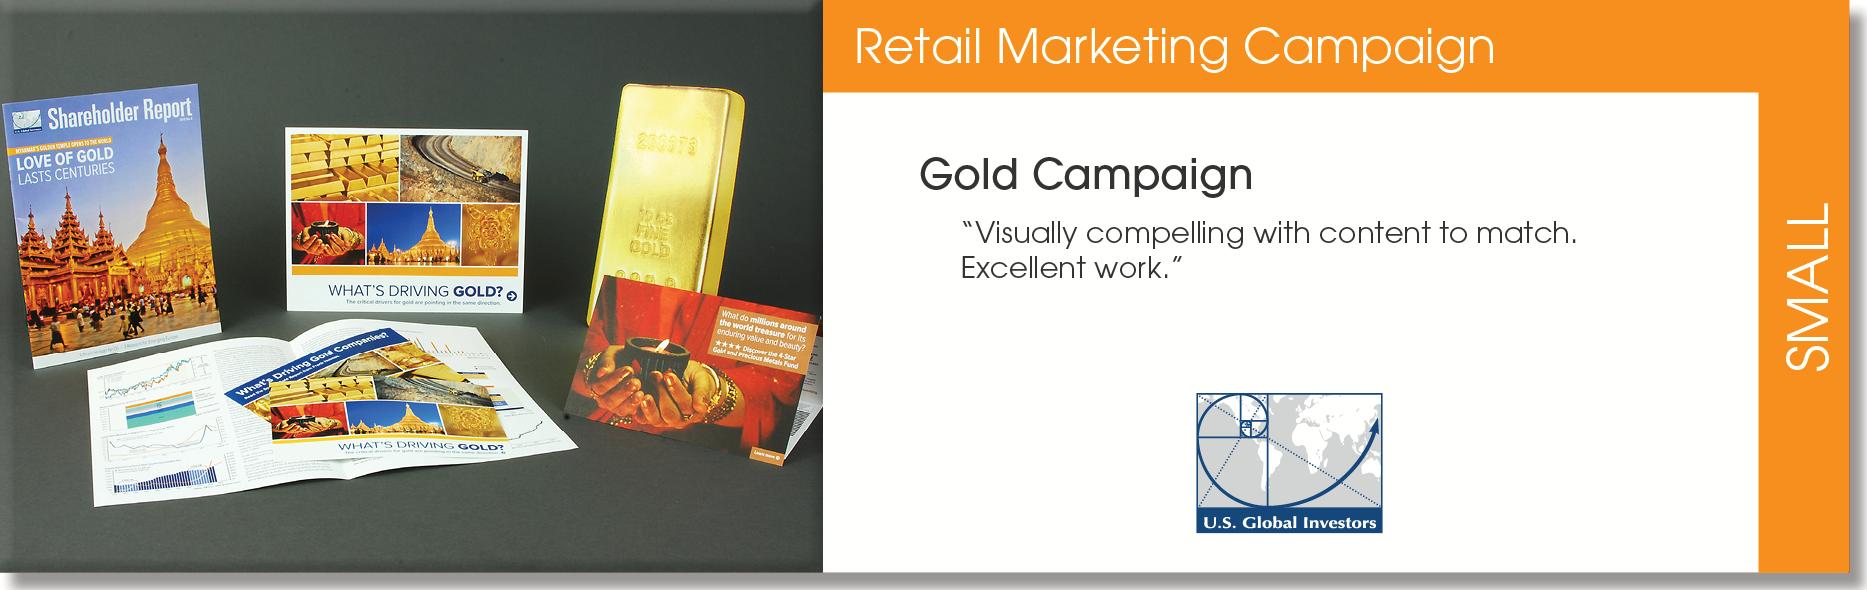 Small Retail Winner Image5